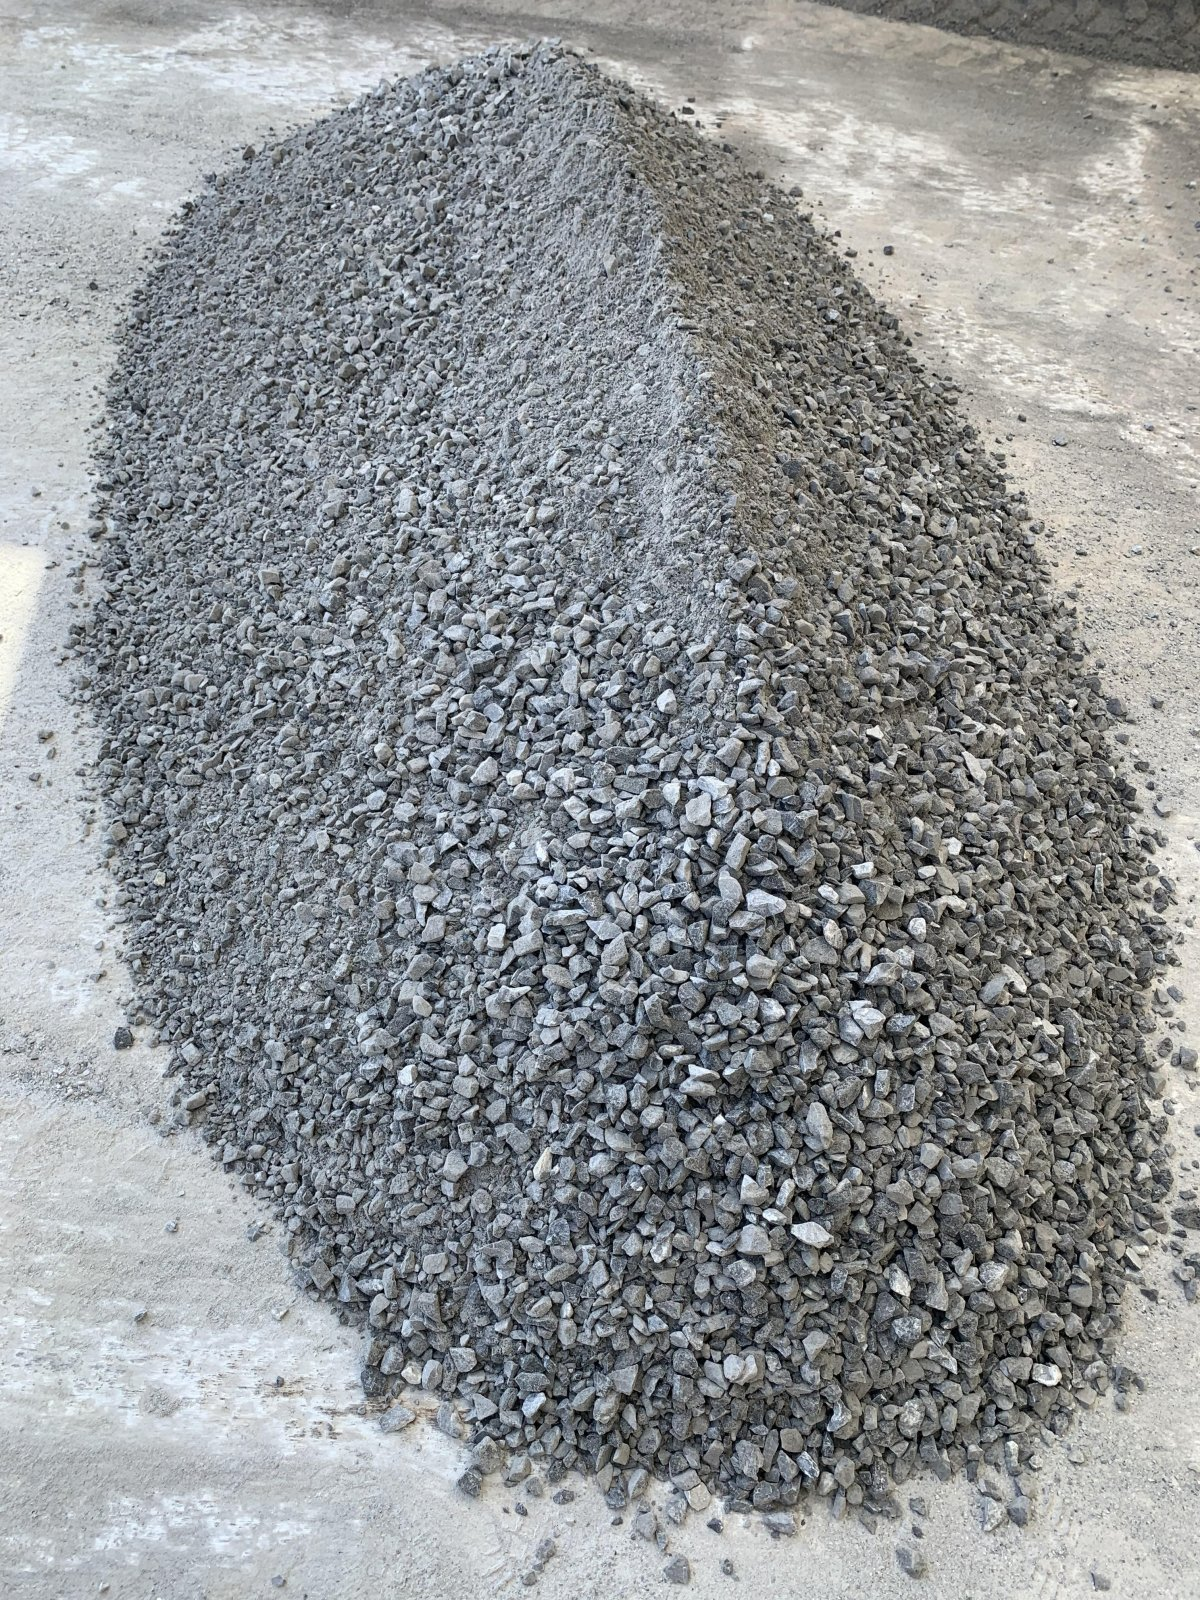 2A Modified Stone - Crusher Run